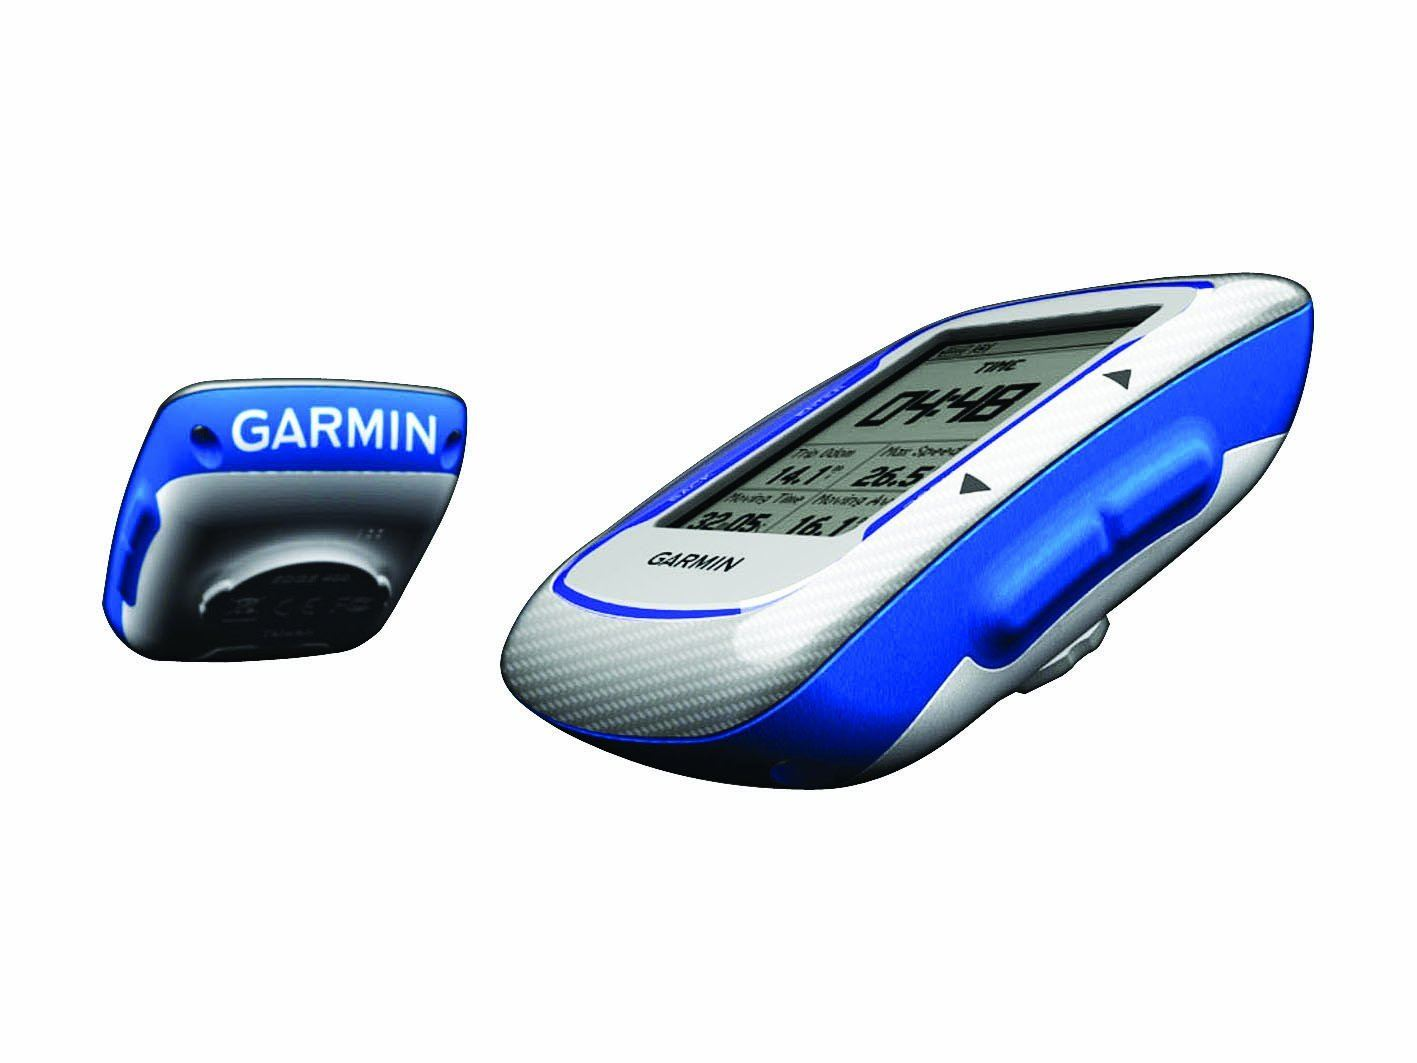 garmin edge 500 gps ant lightweight bike computer blue Garmin Edge 305 Garmin Edge 305